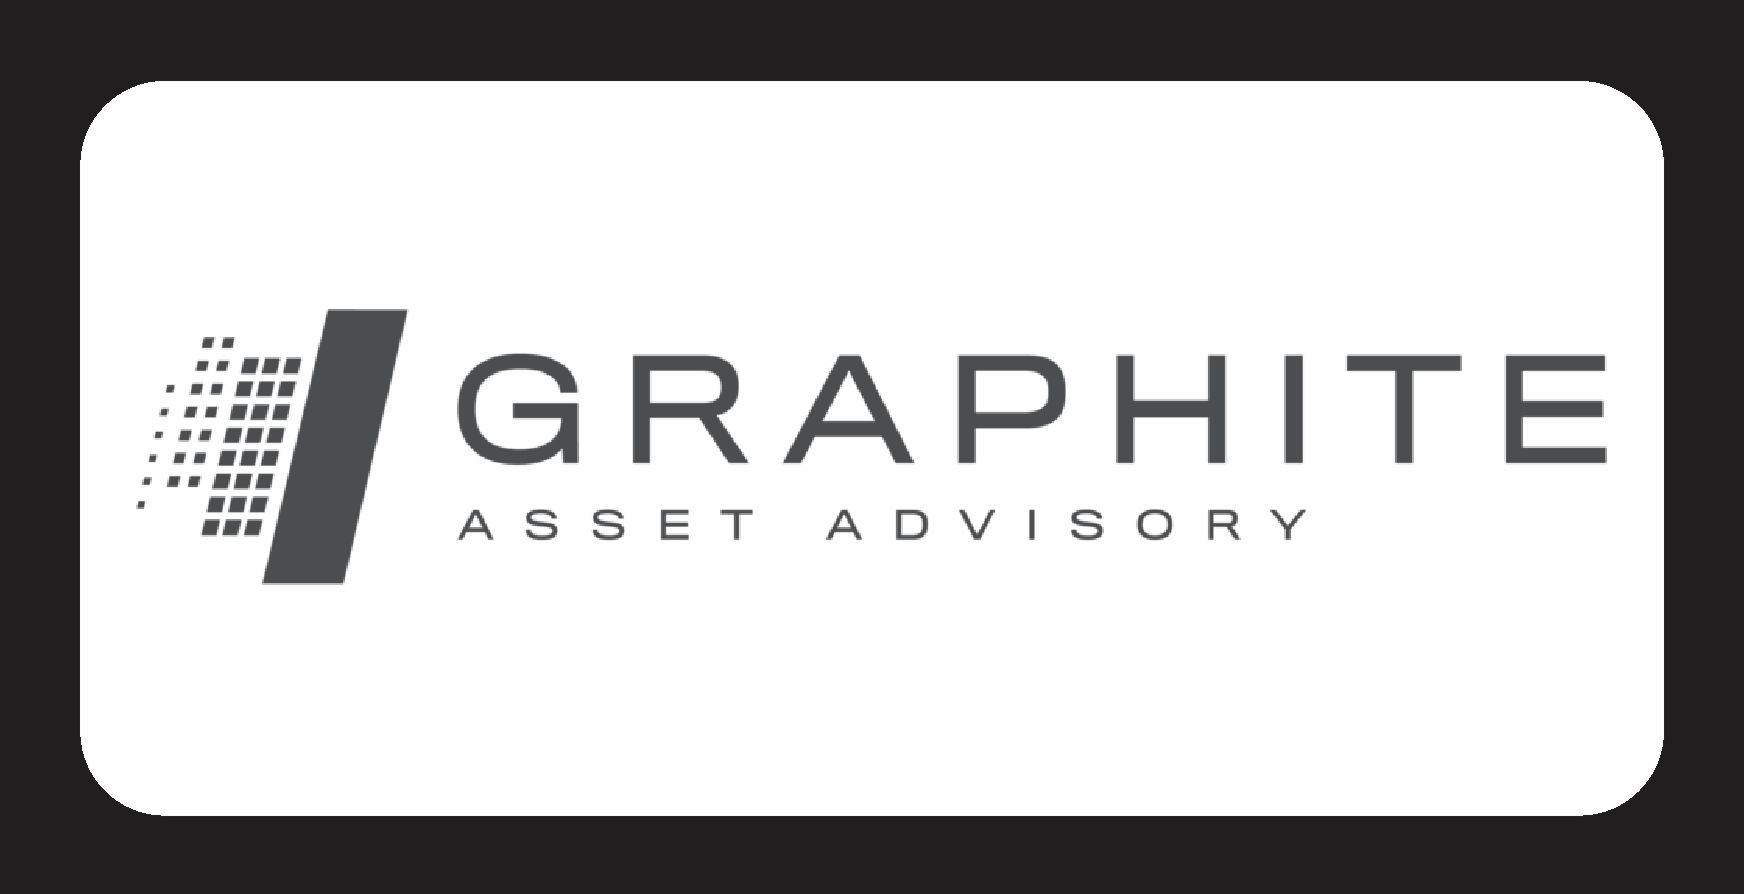 Graphite_Asset_Advisory